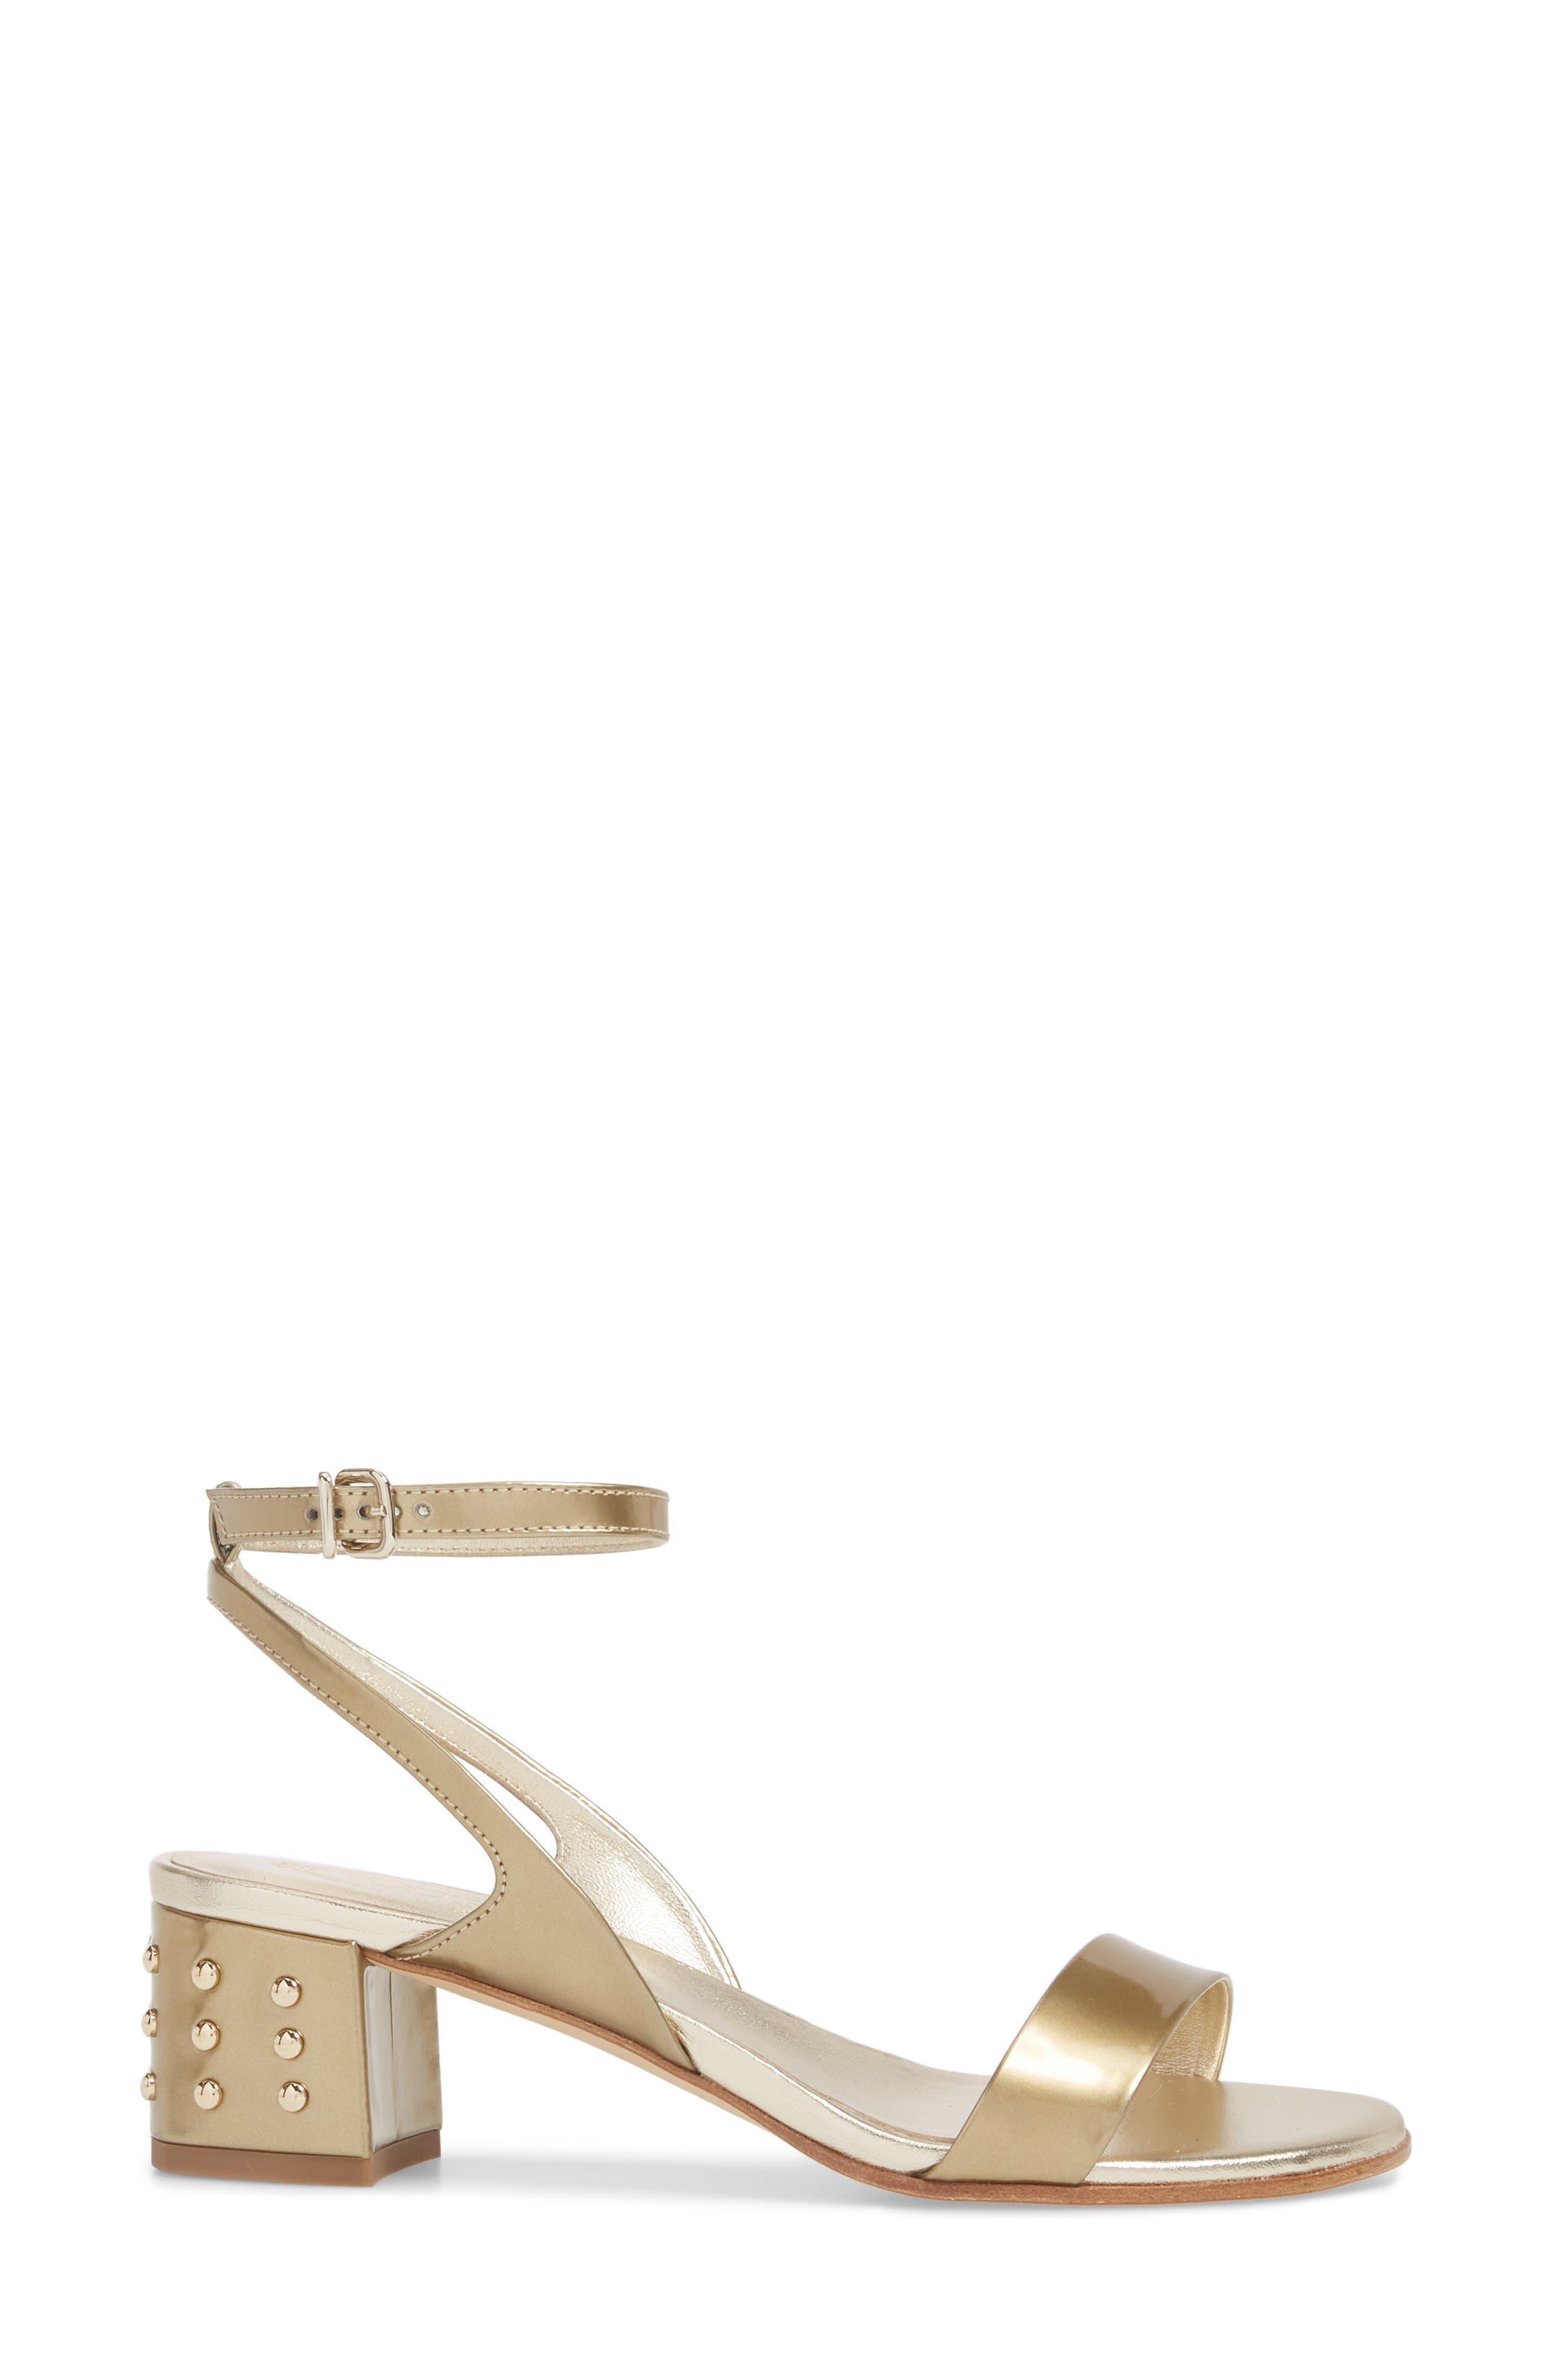 Gommini Block Heel Sandal,                             Alternate thumbnail 3, color,                             710